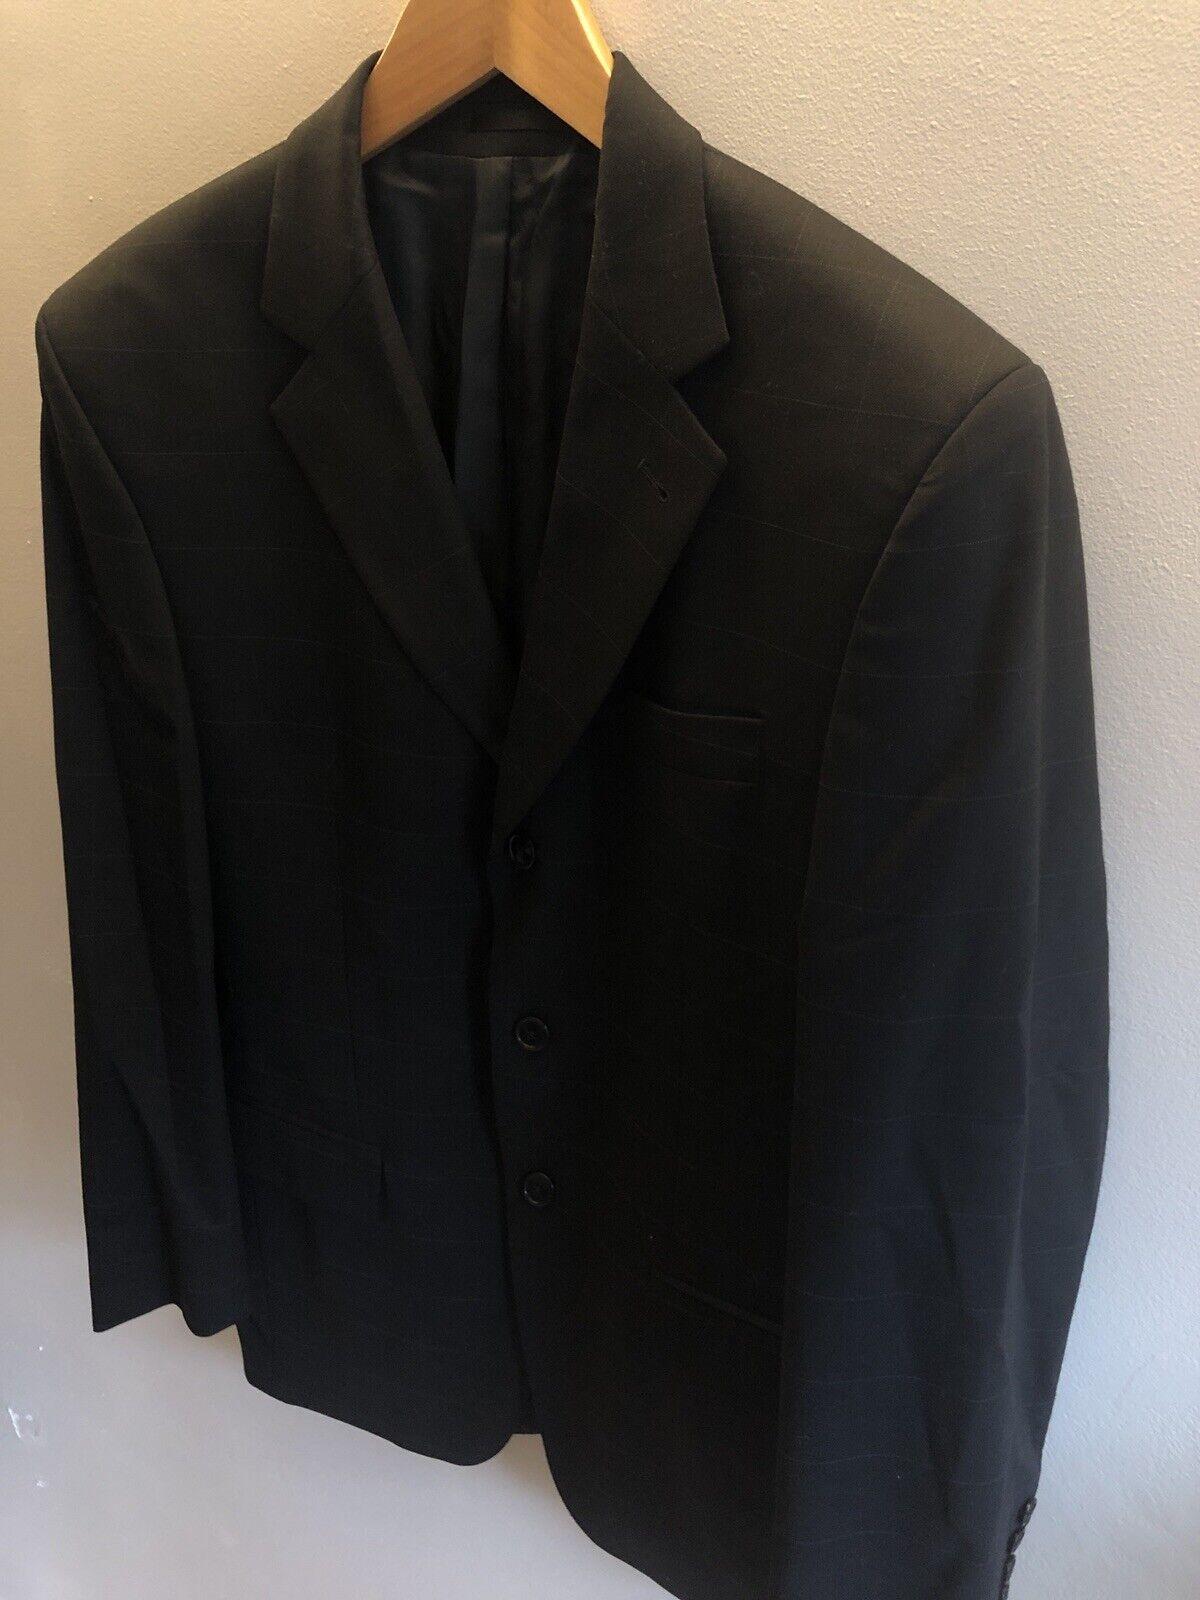 Mens Dehavilland Black Check Suit Blazer Jacket - 38R